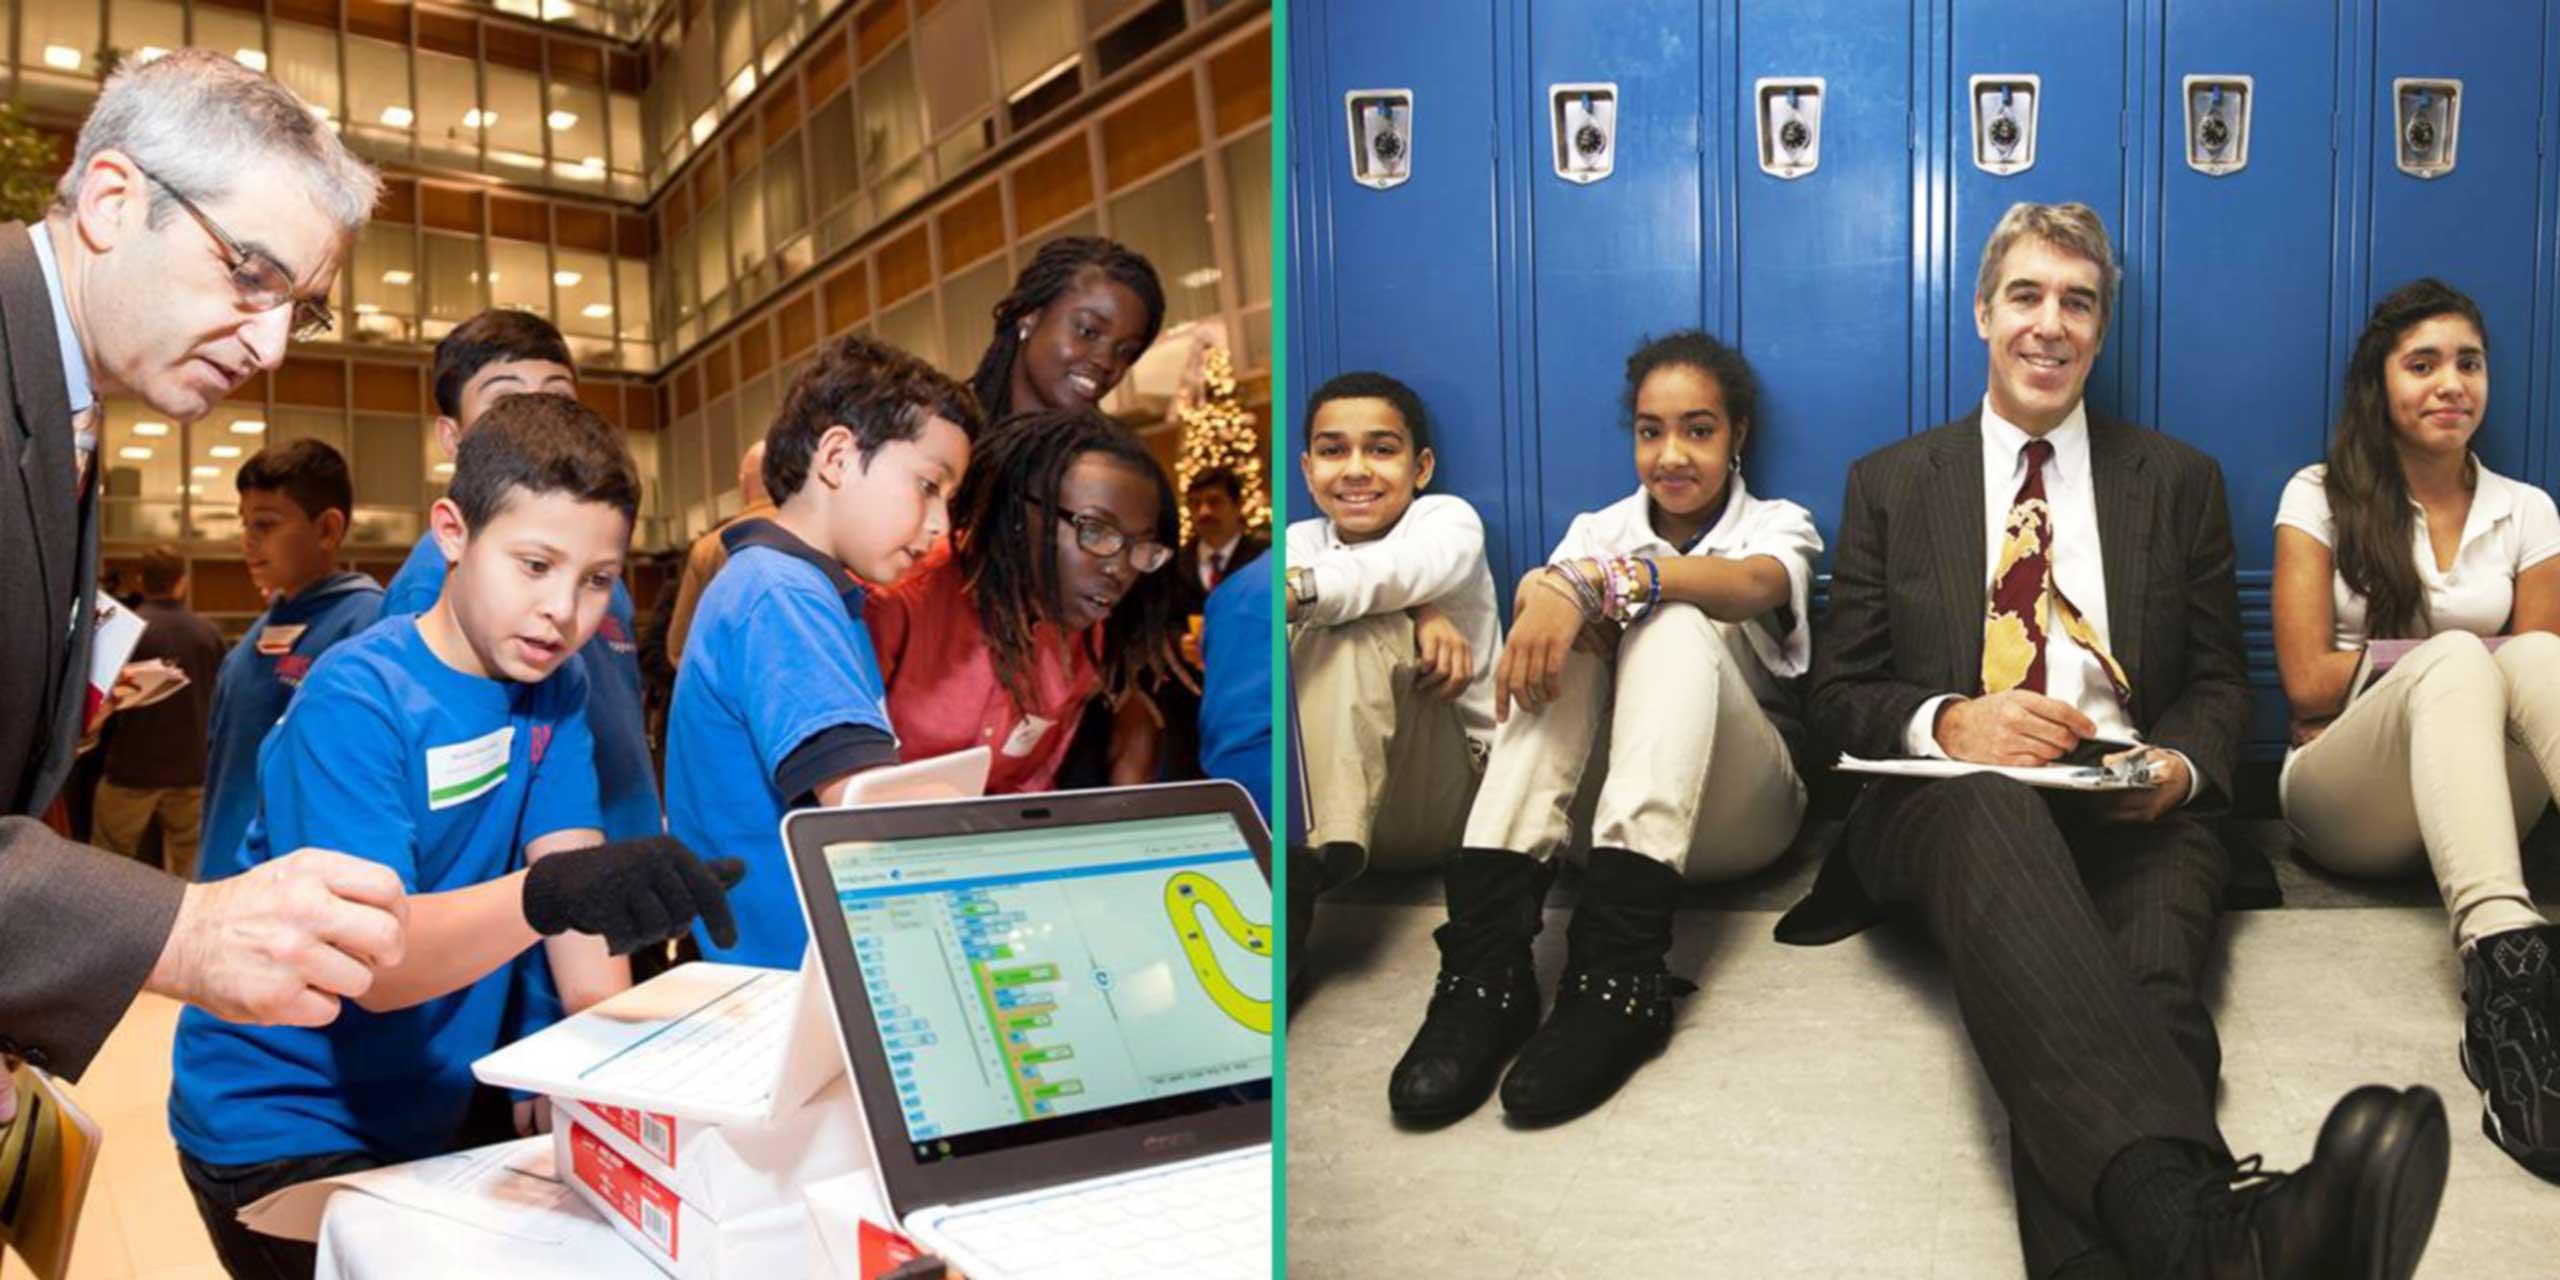 http://skollworldforumorg.c.presscdn.com/wp-content/uploads/2014/10/citizen-schools-sl3.jpg